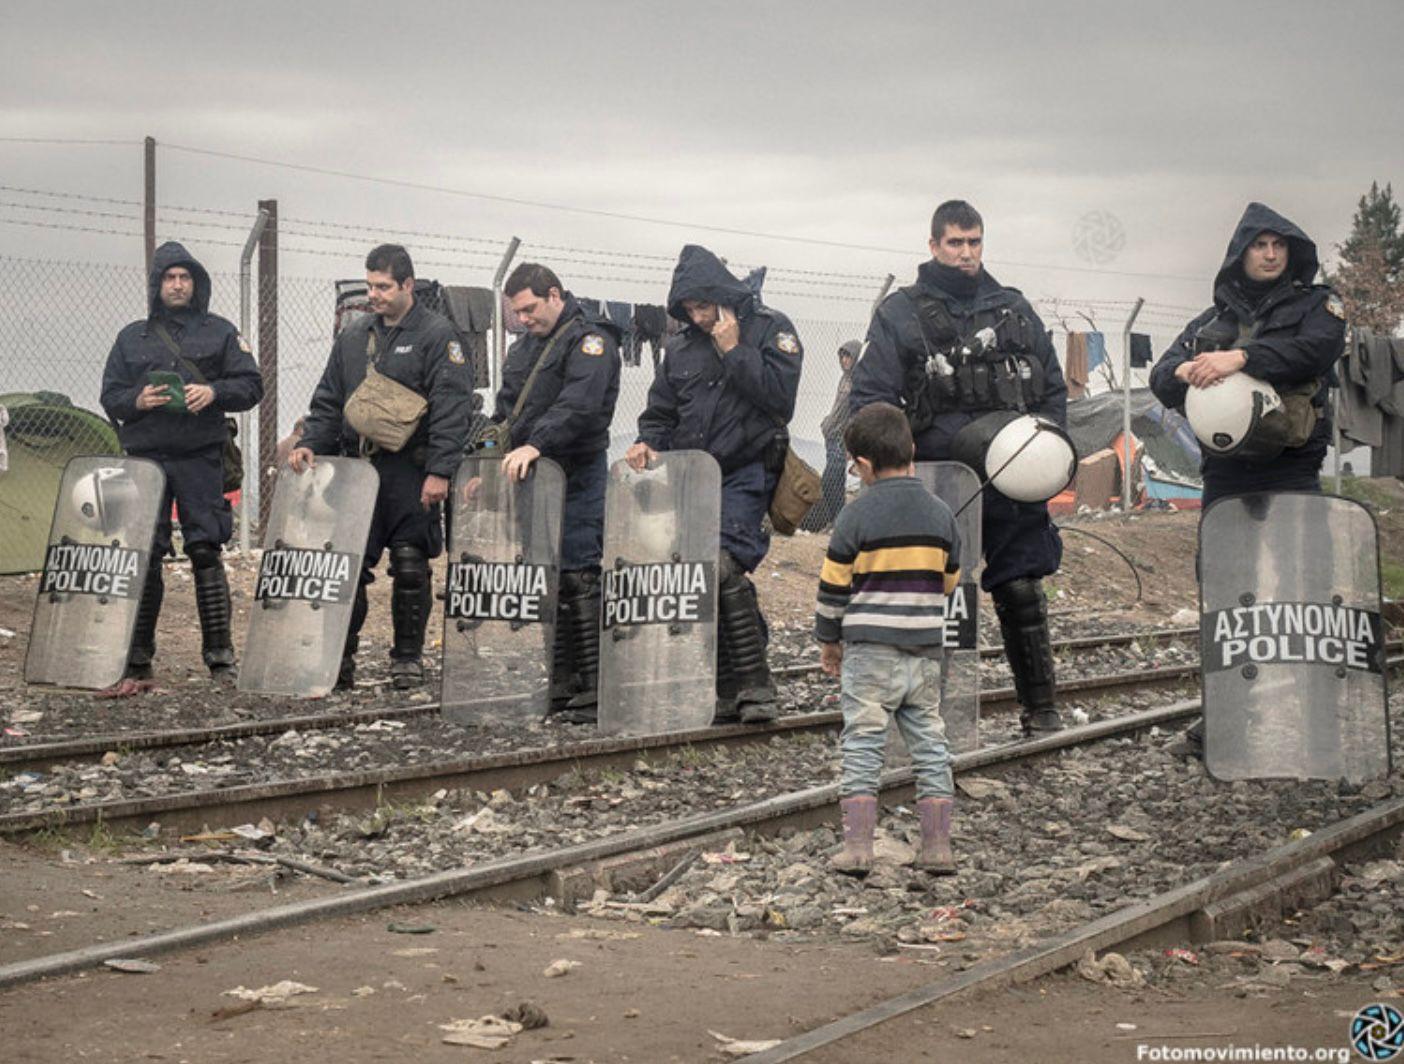 Migrar i resistir